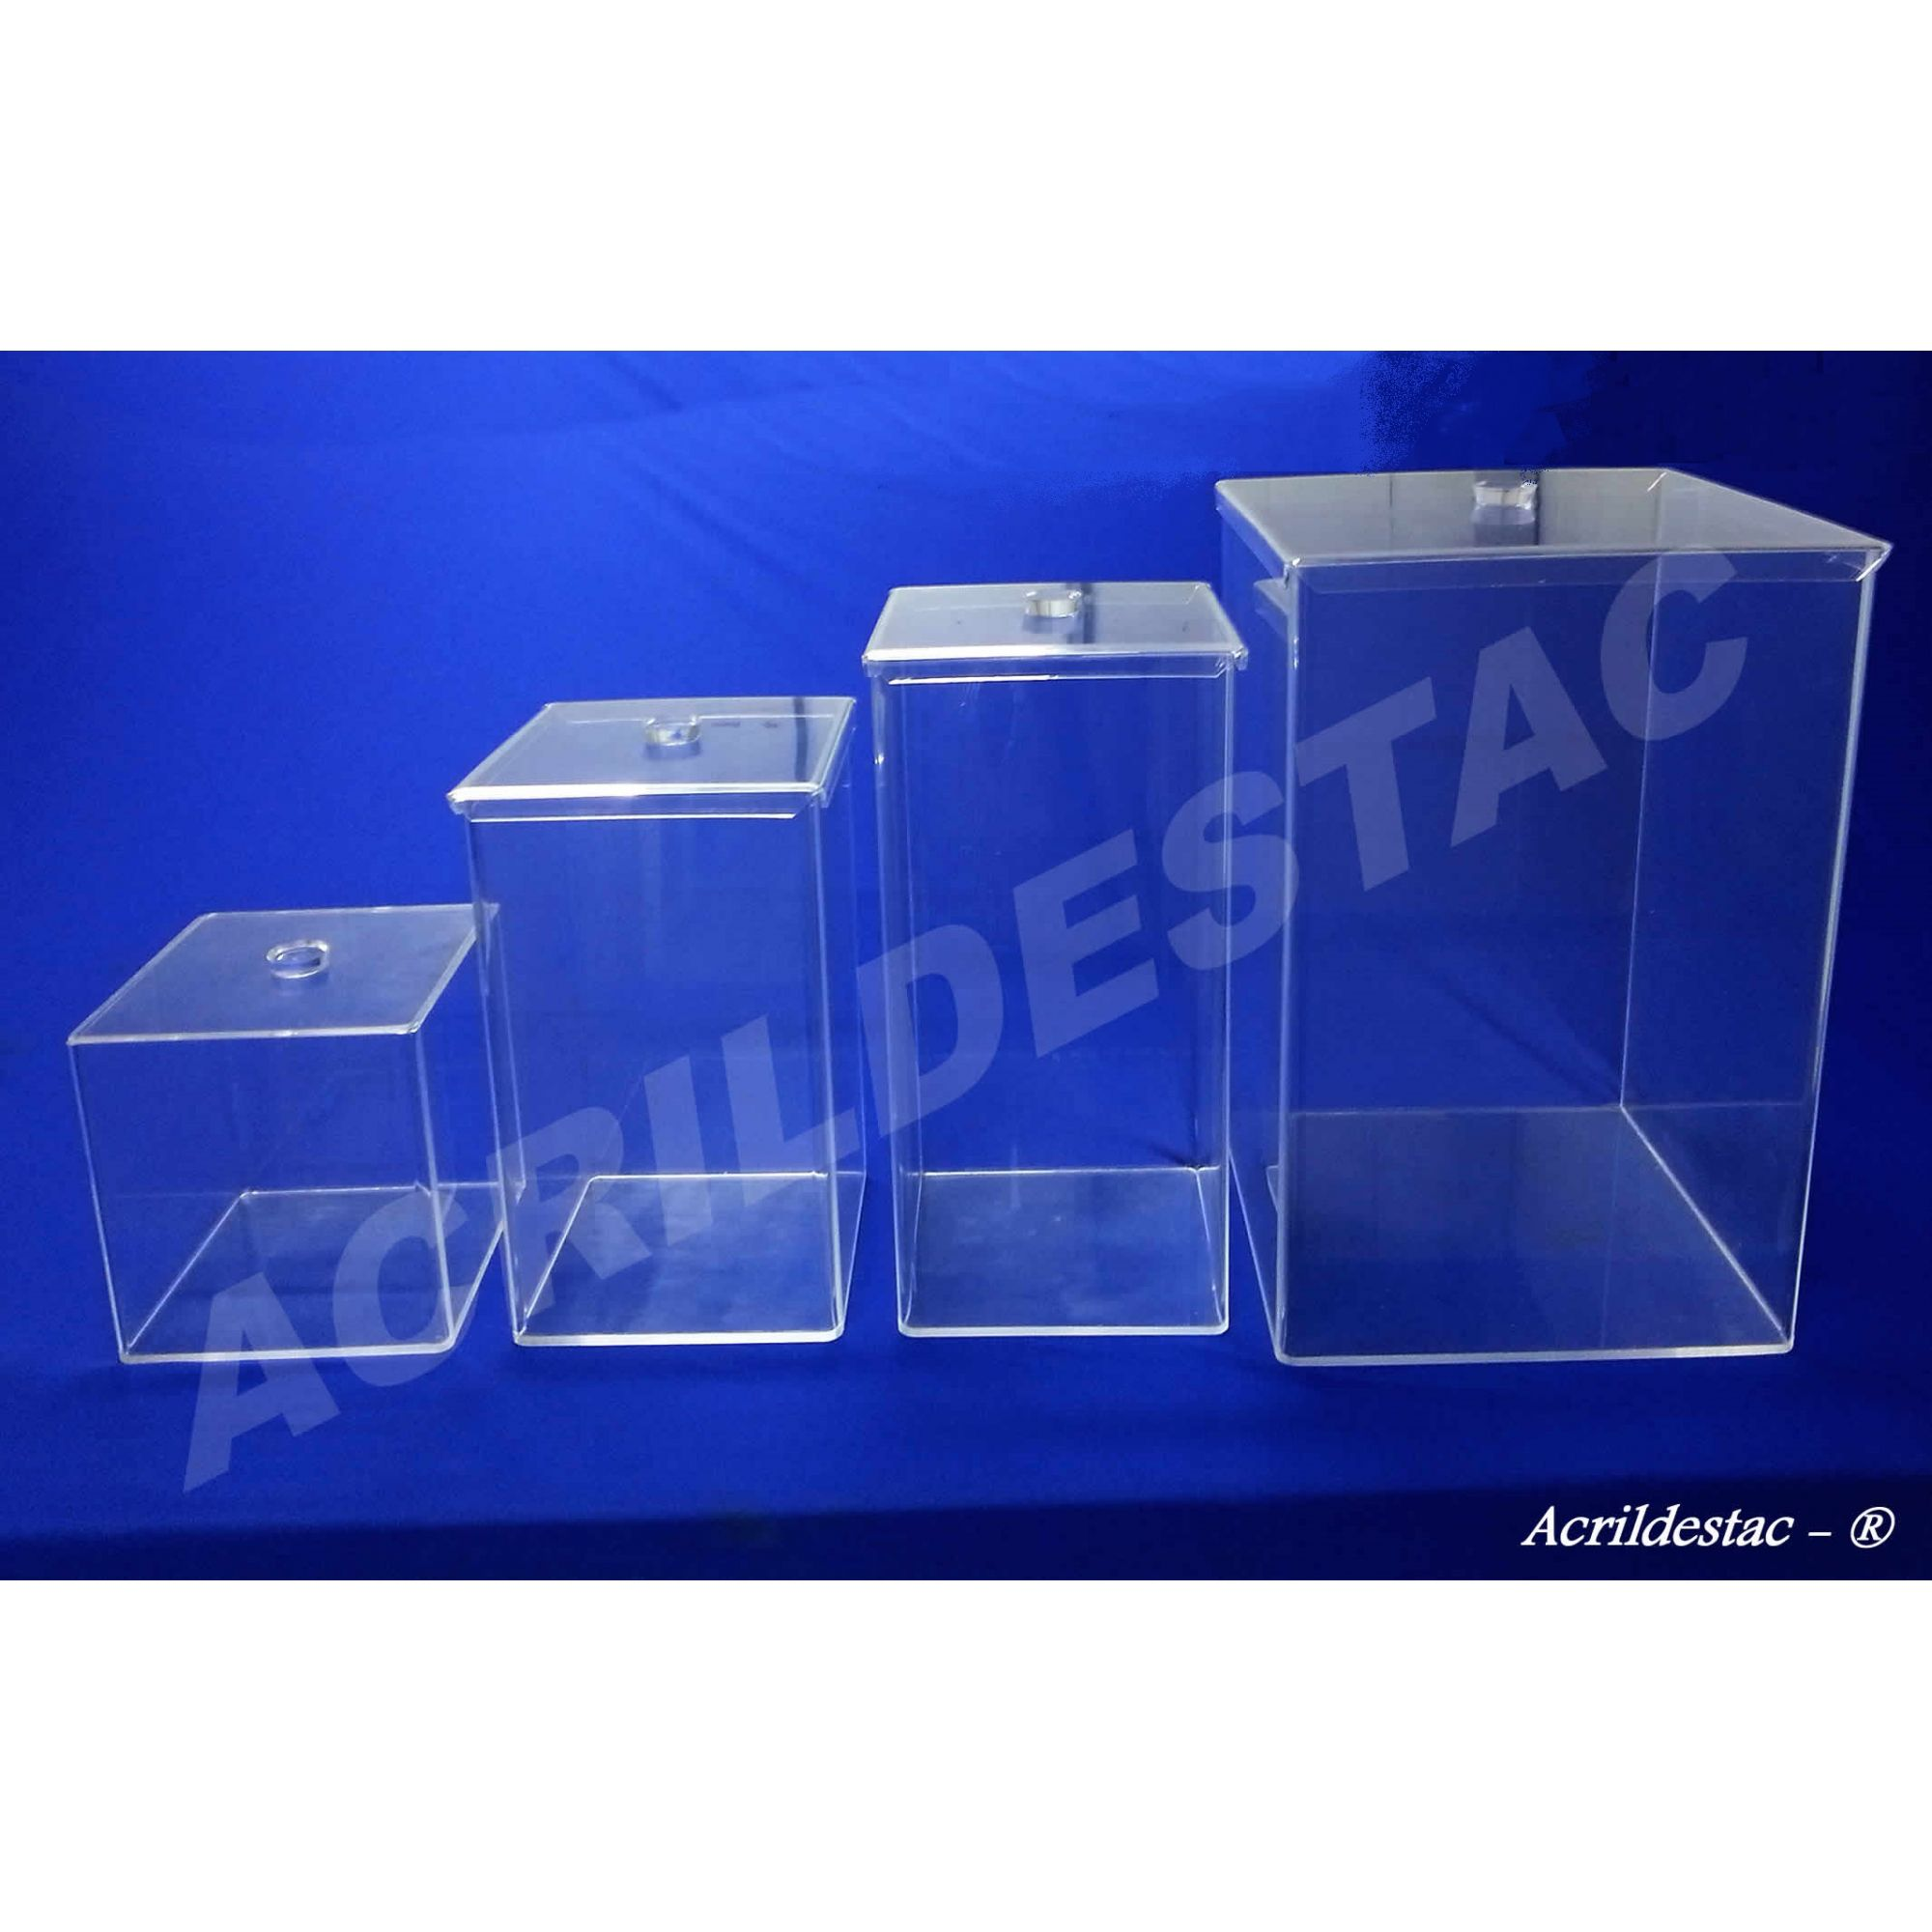 Potes de acrílico para alimentos secos e condimentos 20 x 20 cm (alt x base) - 8,0 L